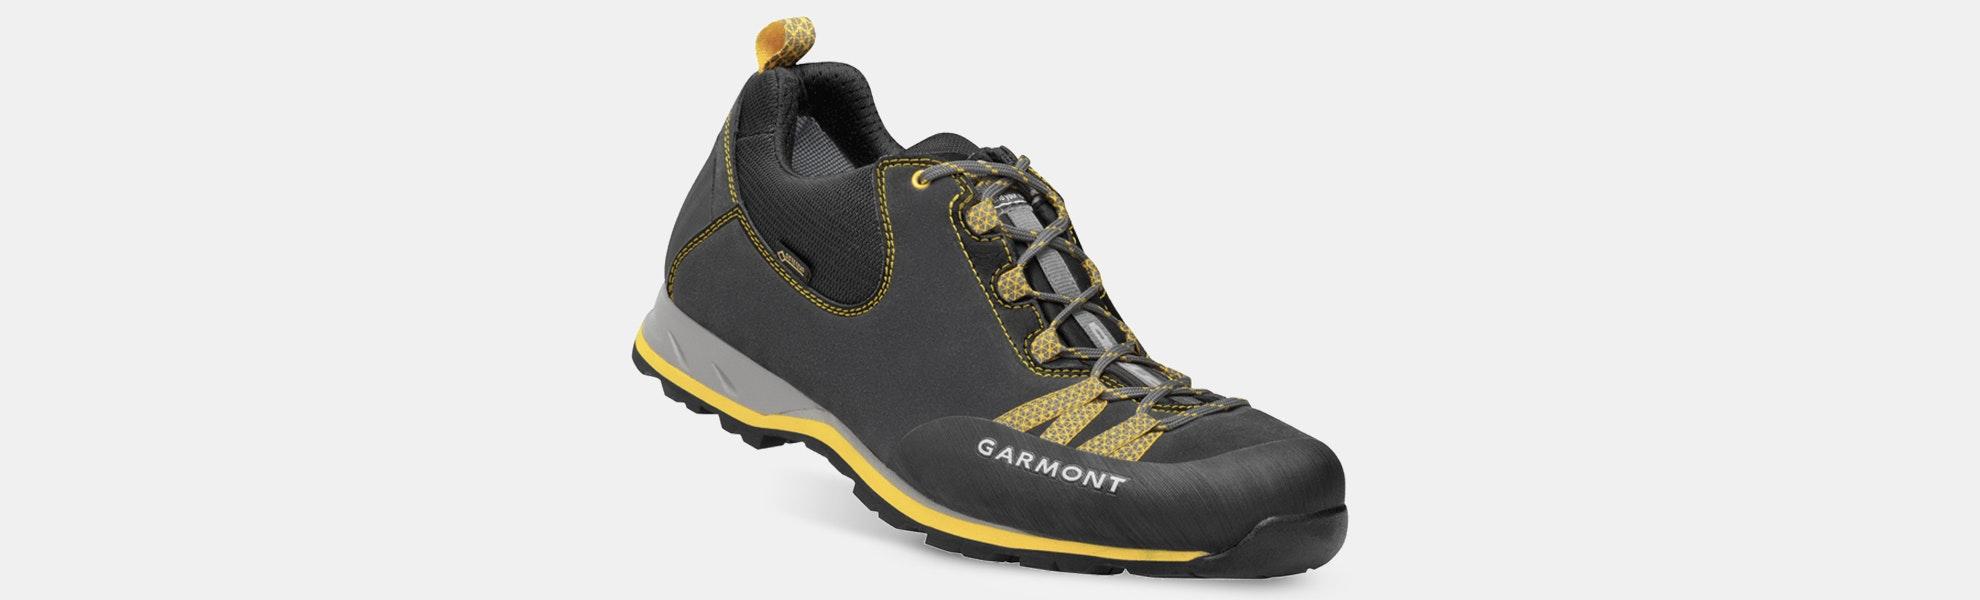 Garmont Mystic II GTX Trail Shoes